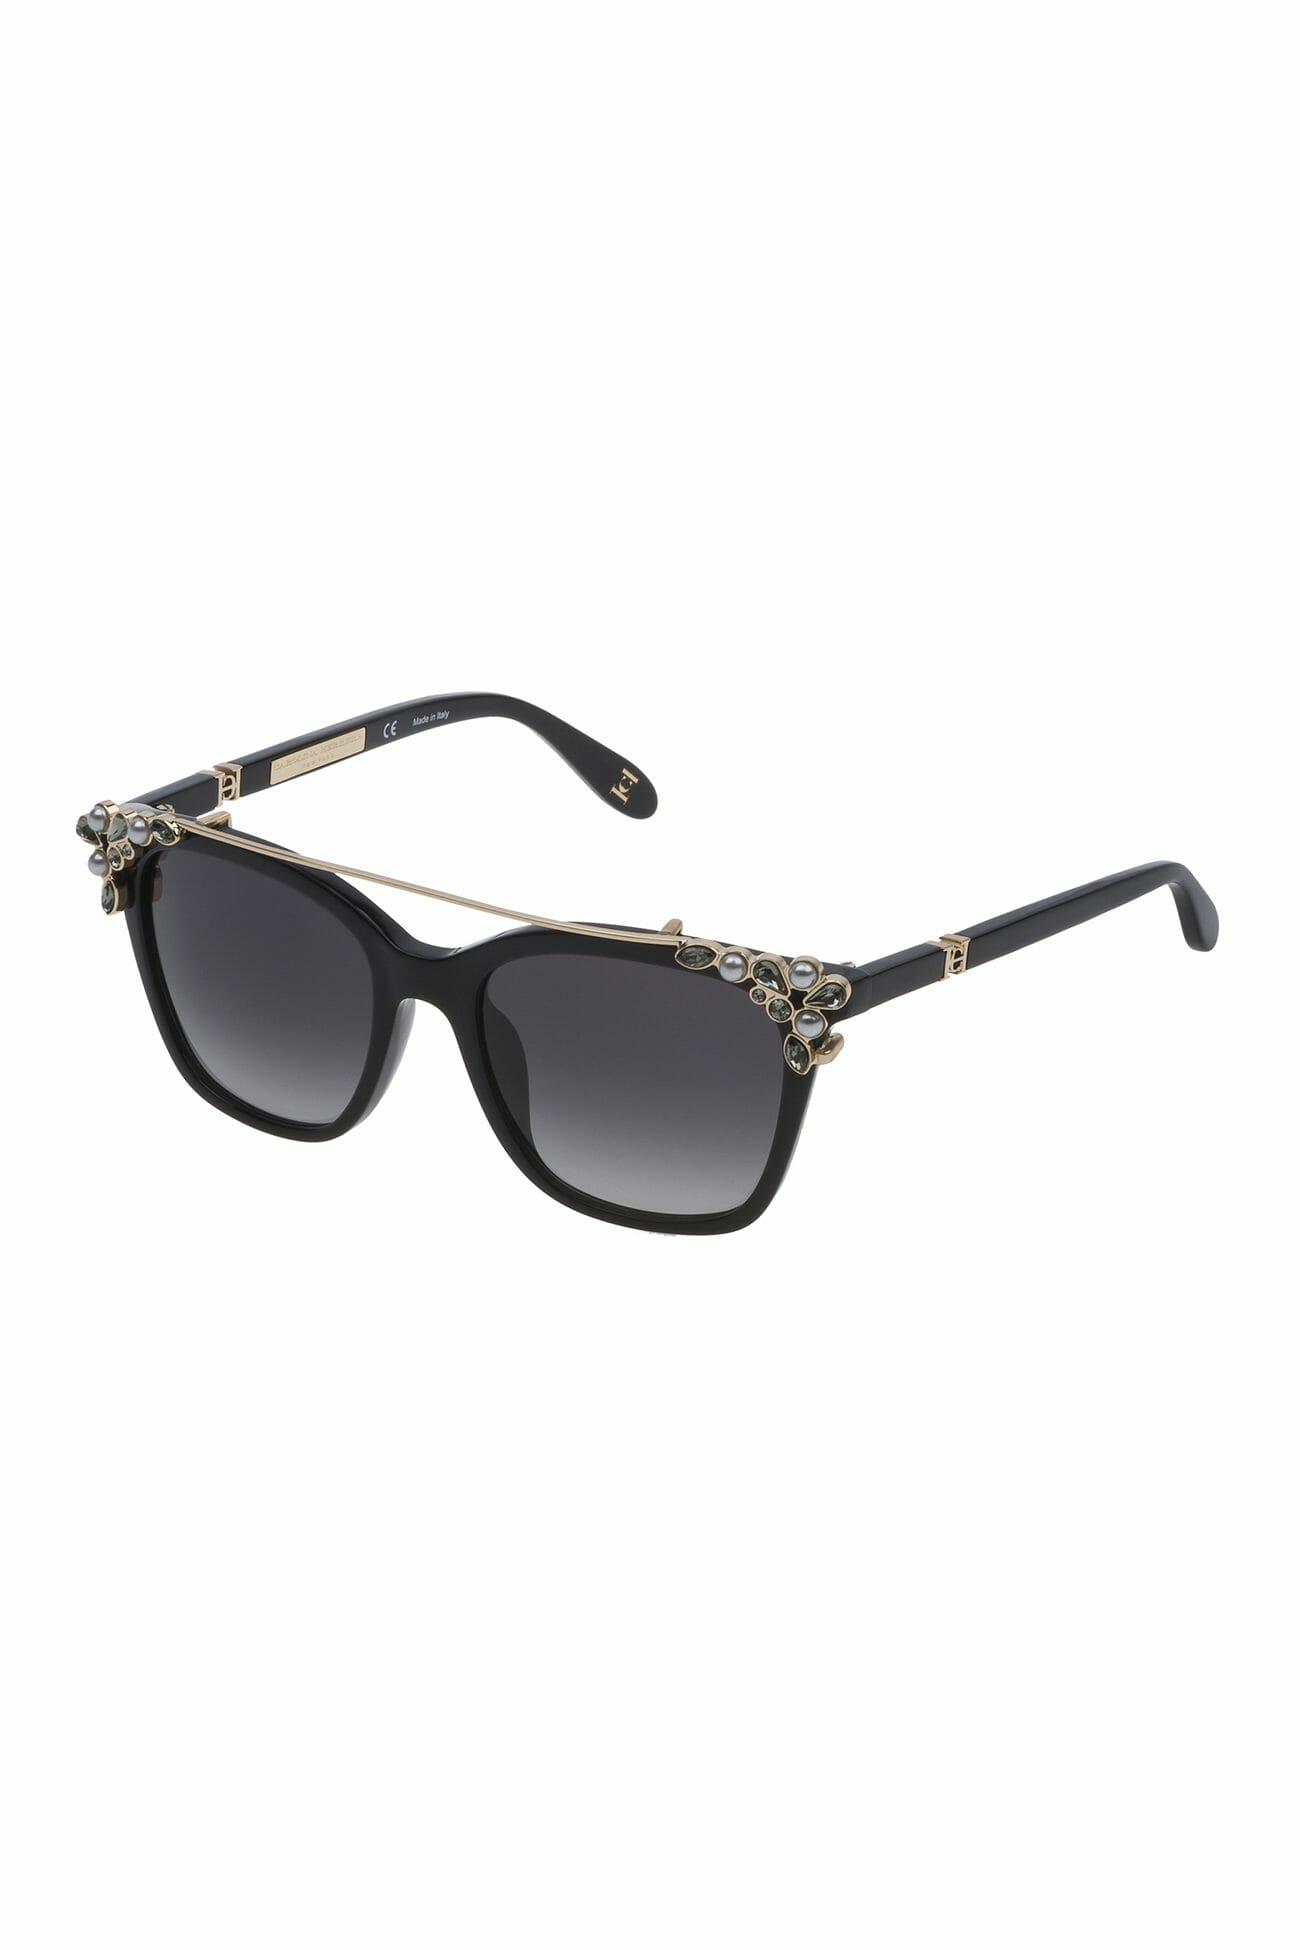 Carolina-Herrera-New-York-Eyewear-Reference700-01